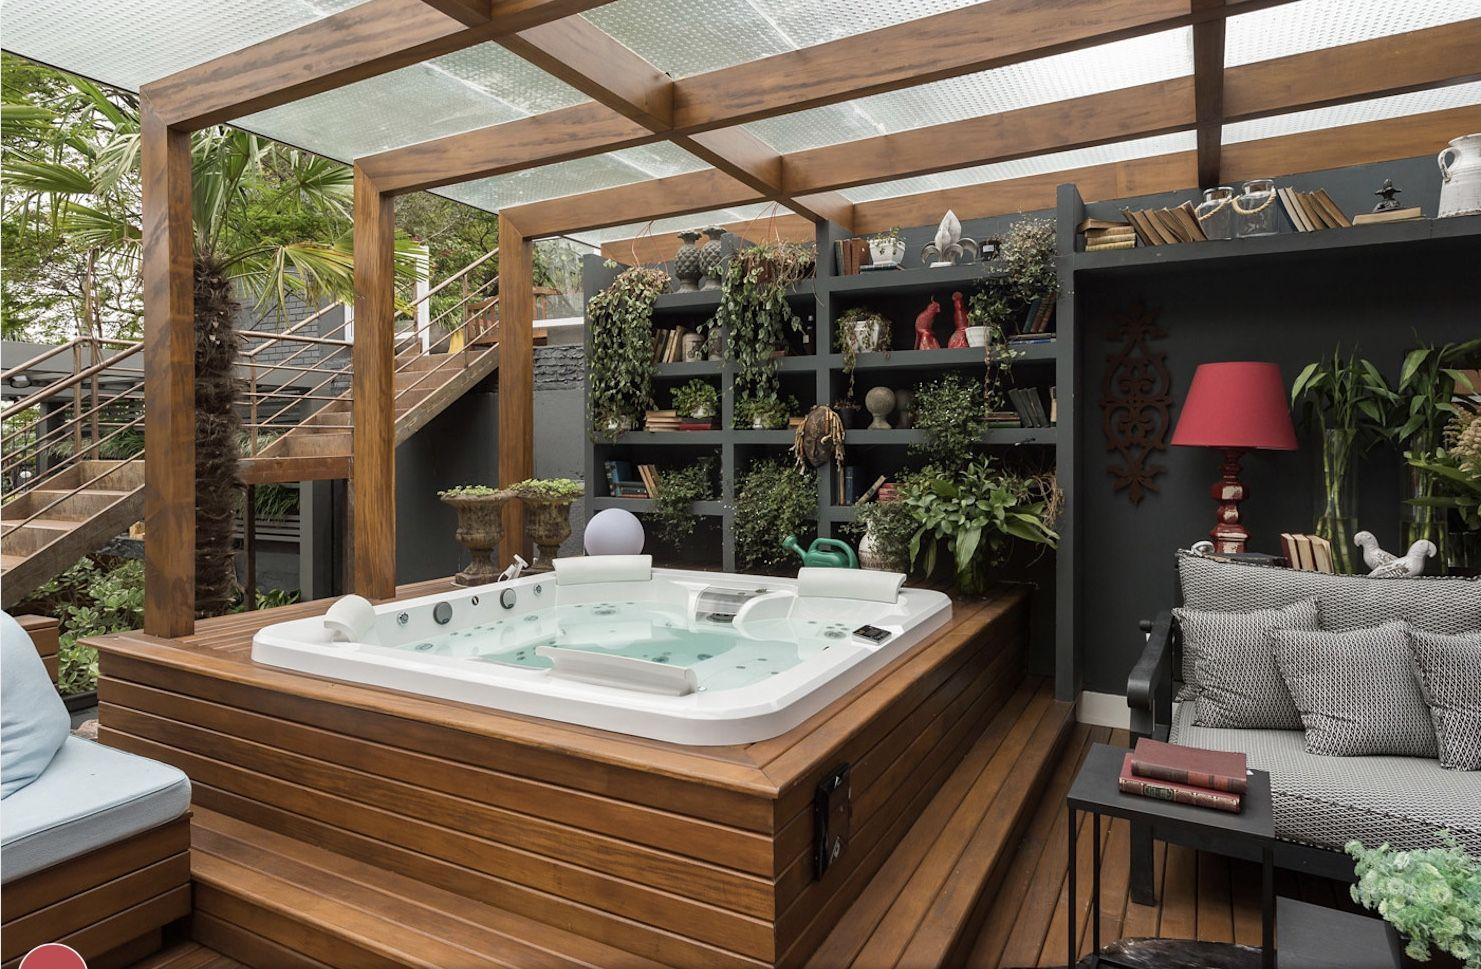 Pin By Karen Pendergraft On Ideas Casa Hot Tub Patio Hot Tub Outdoor Hot Tub Room